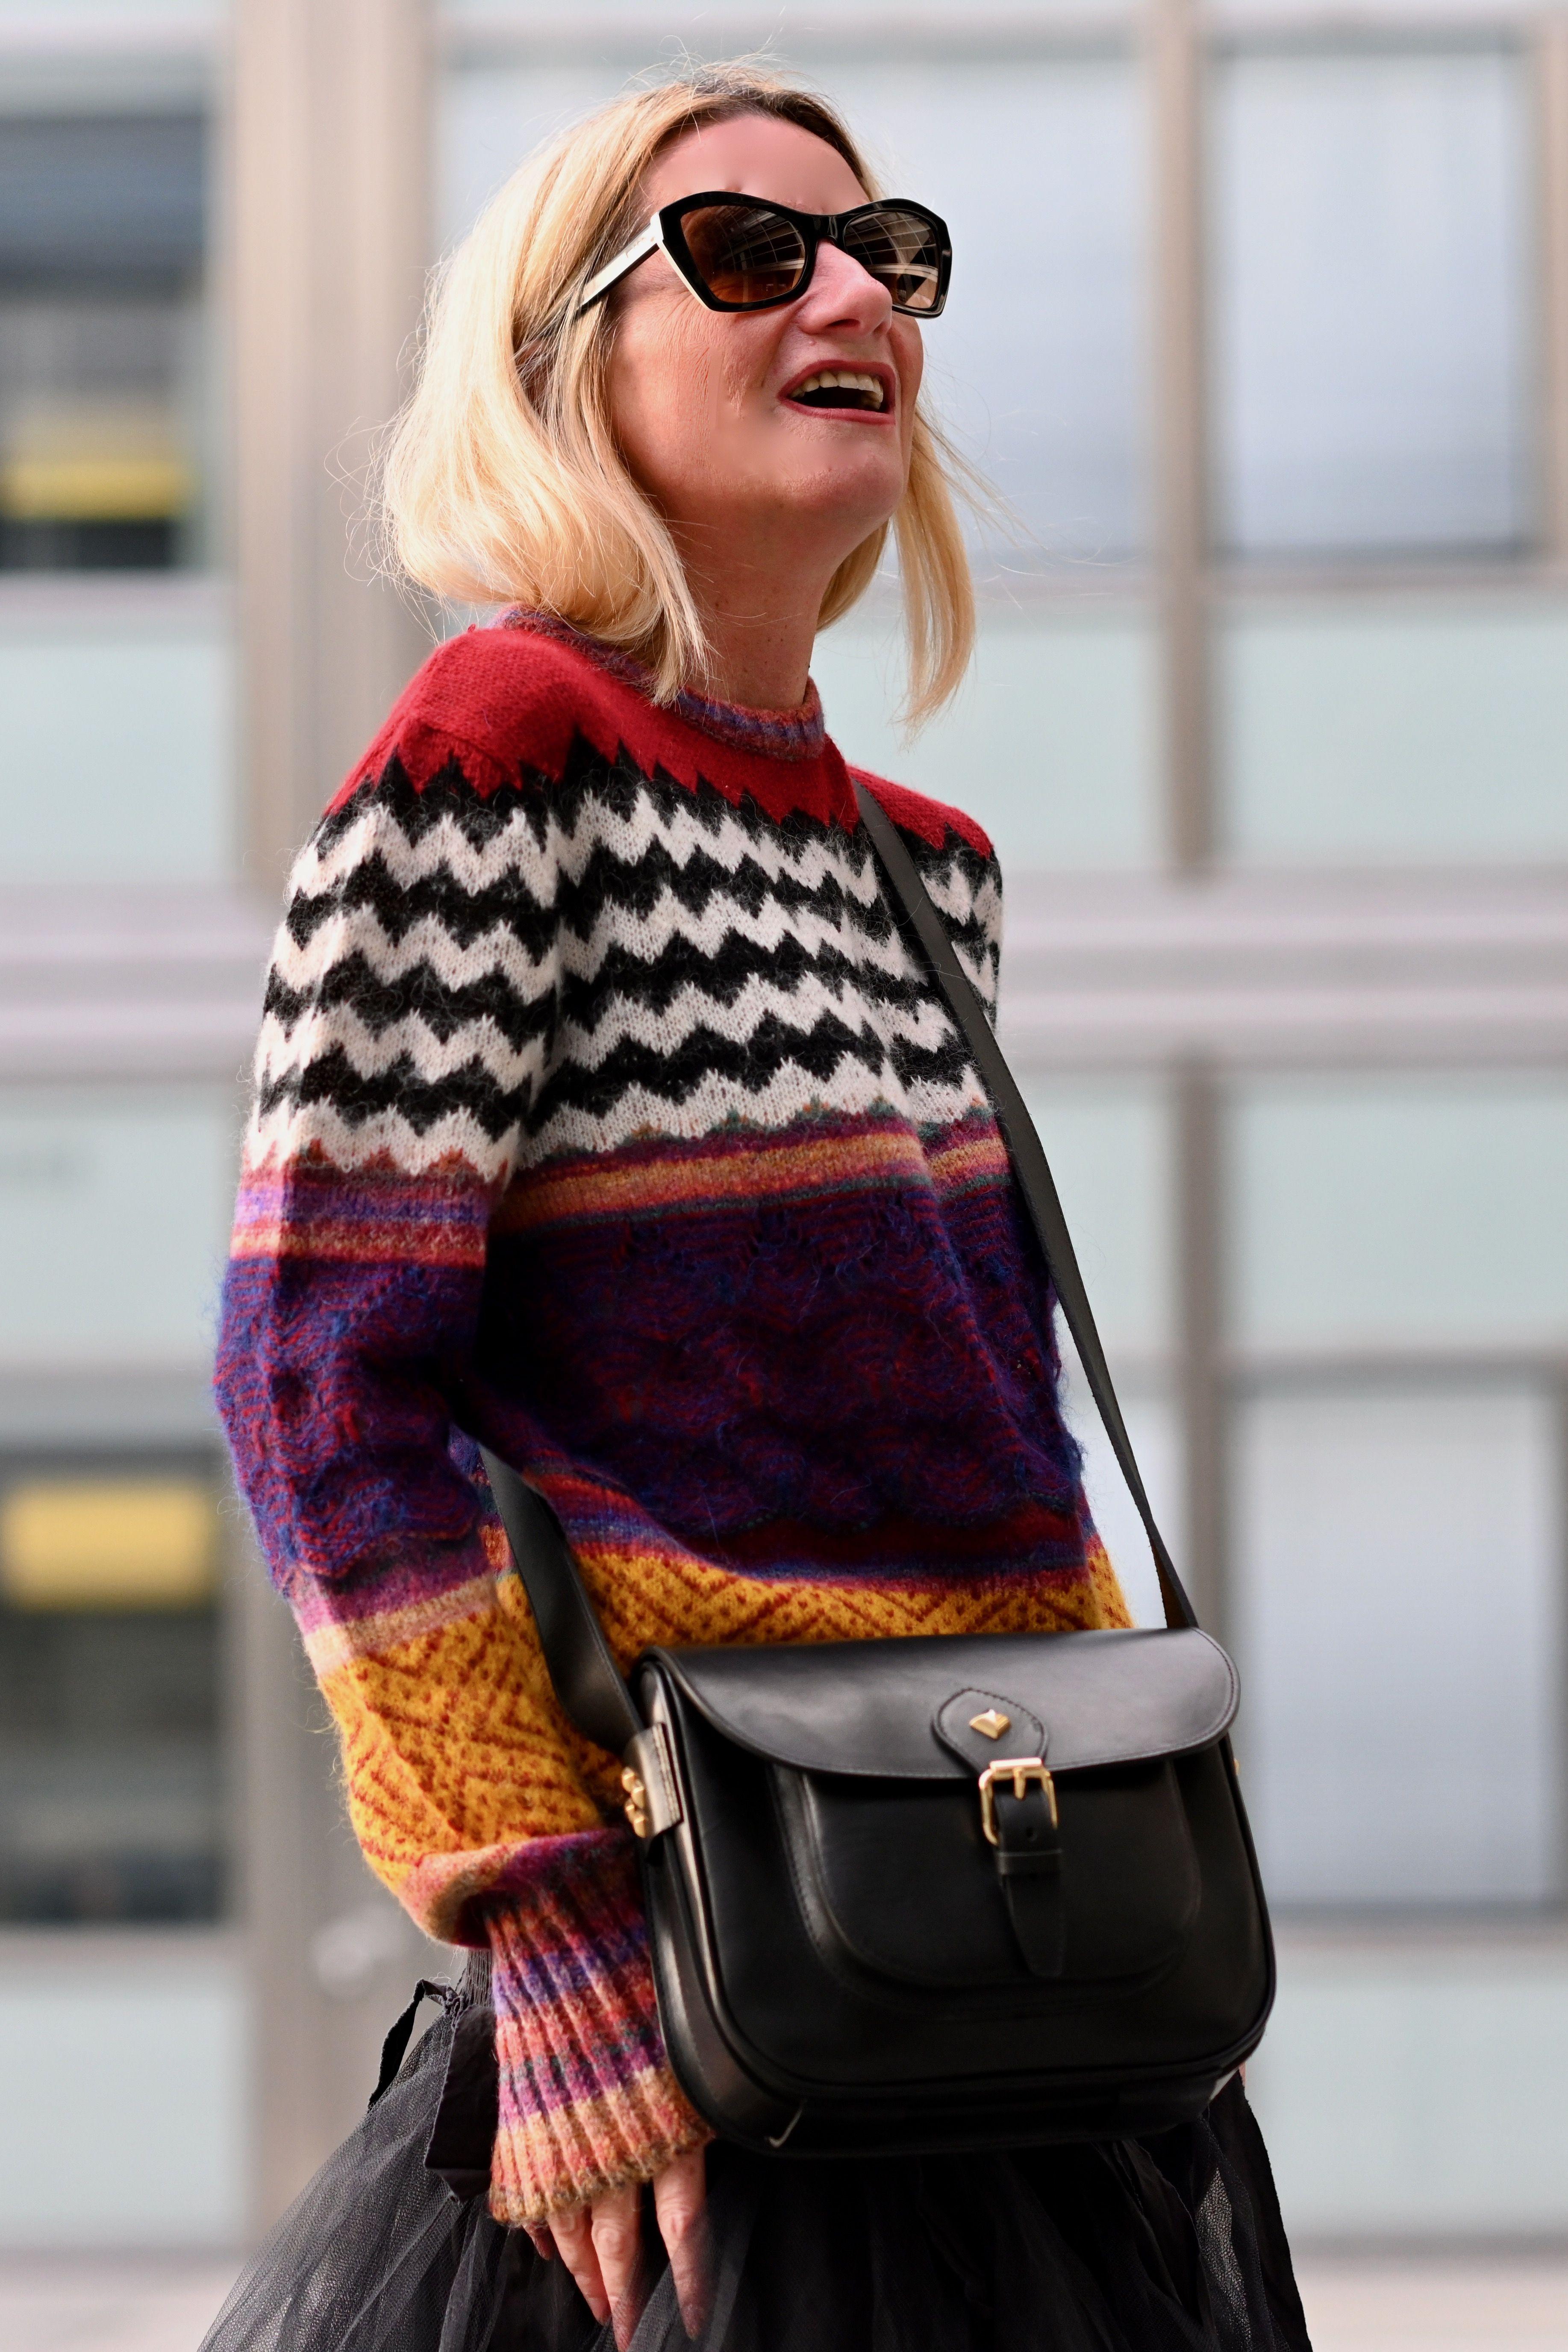 Pin on We Love Curvy Fashion Bloggers